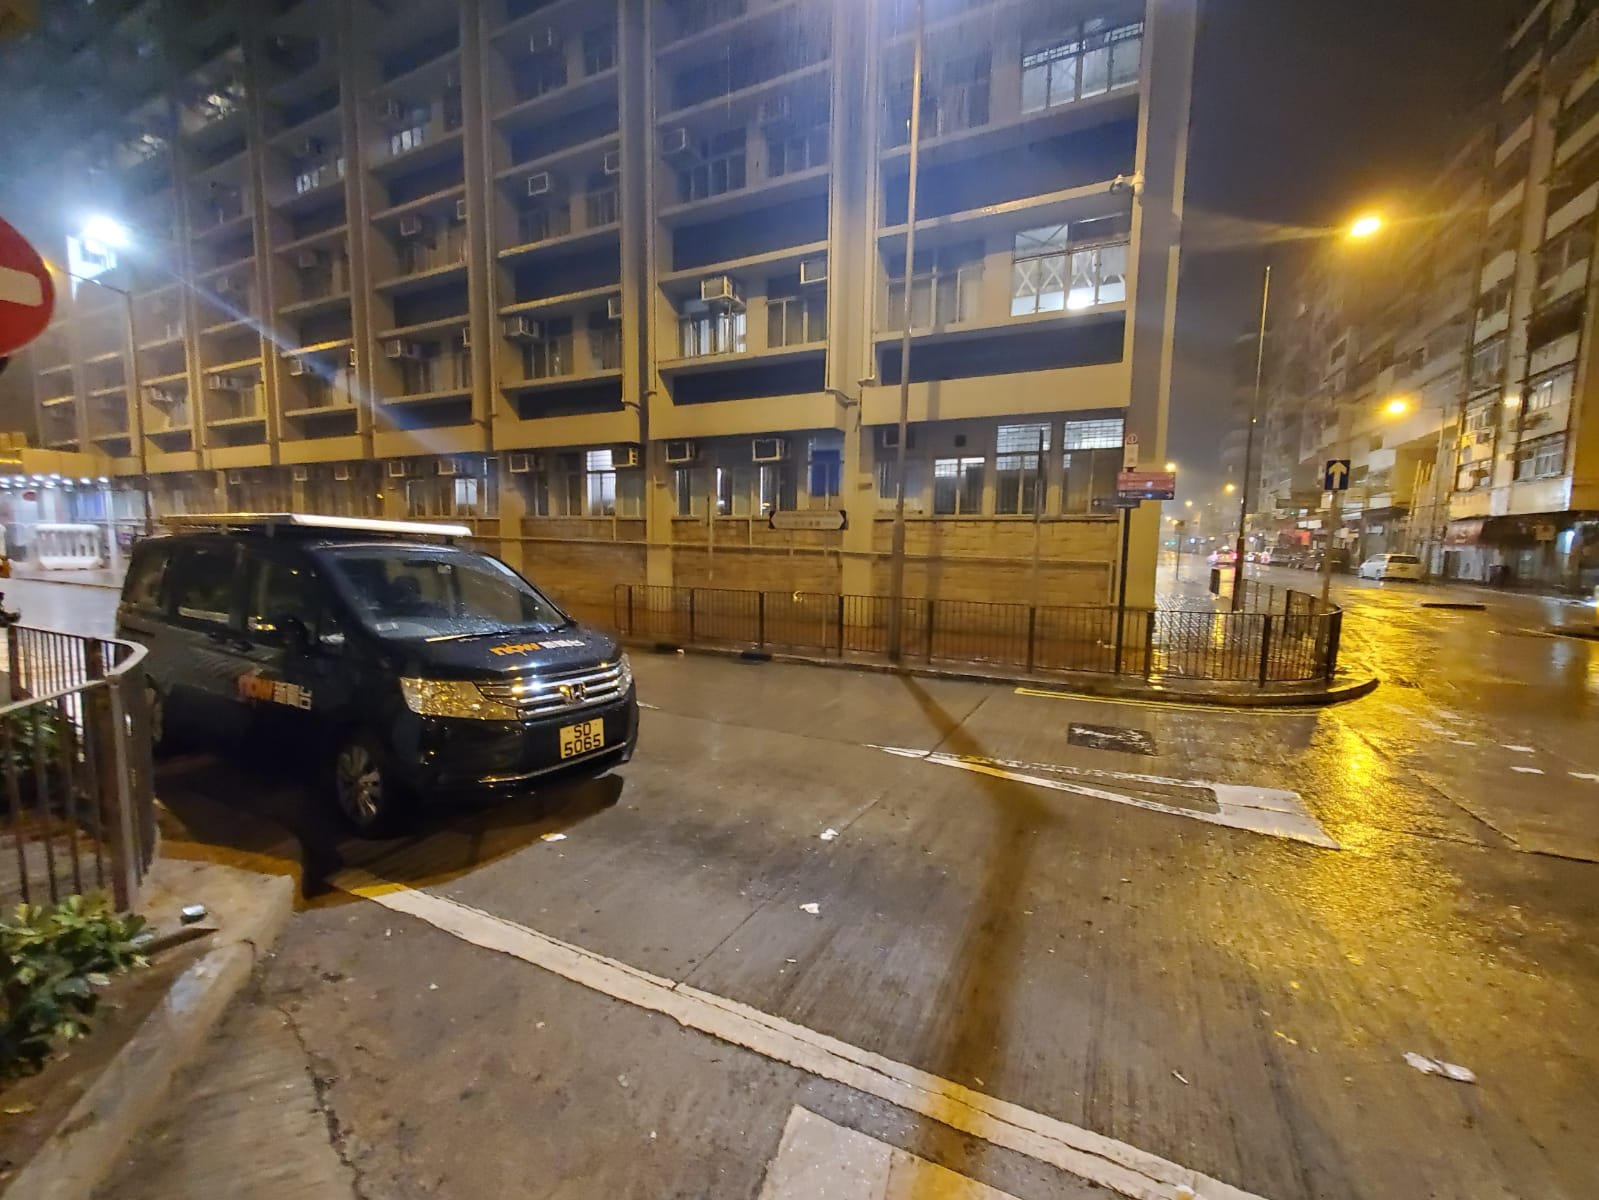 now新聞台採訪車泊於警署外。